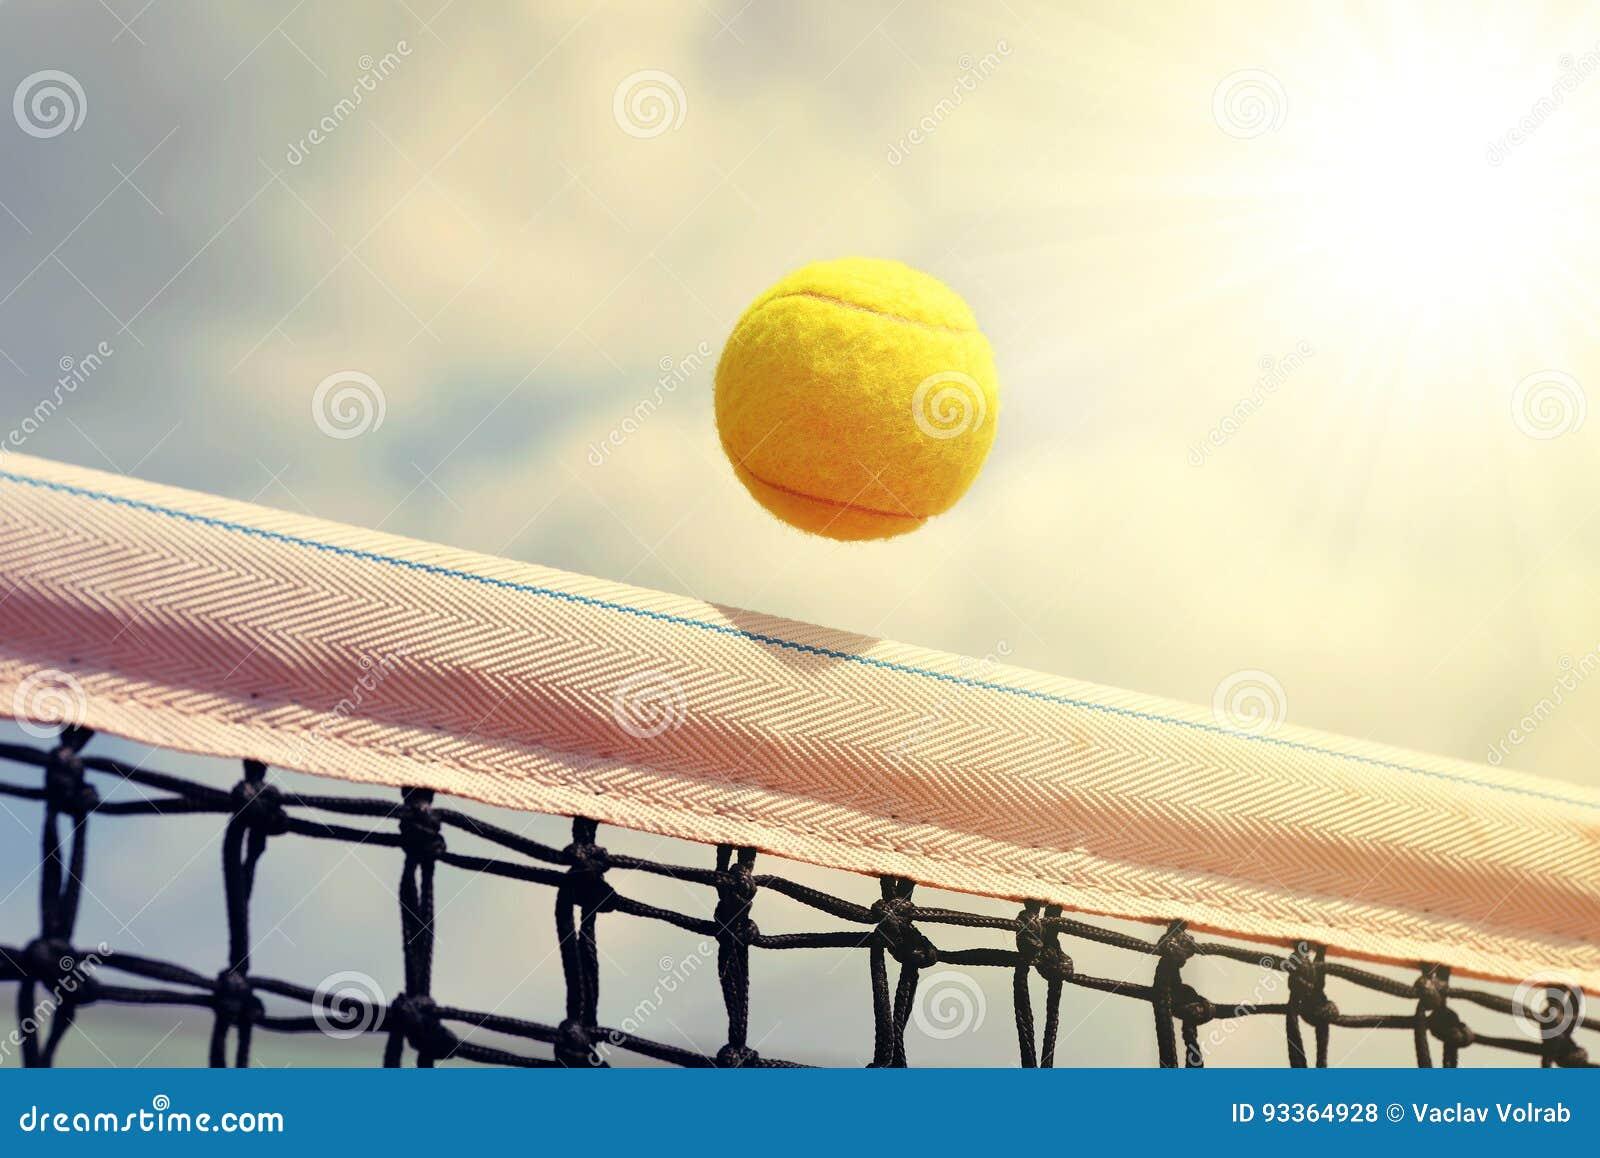 Flying tennis ball.